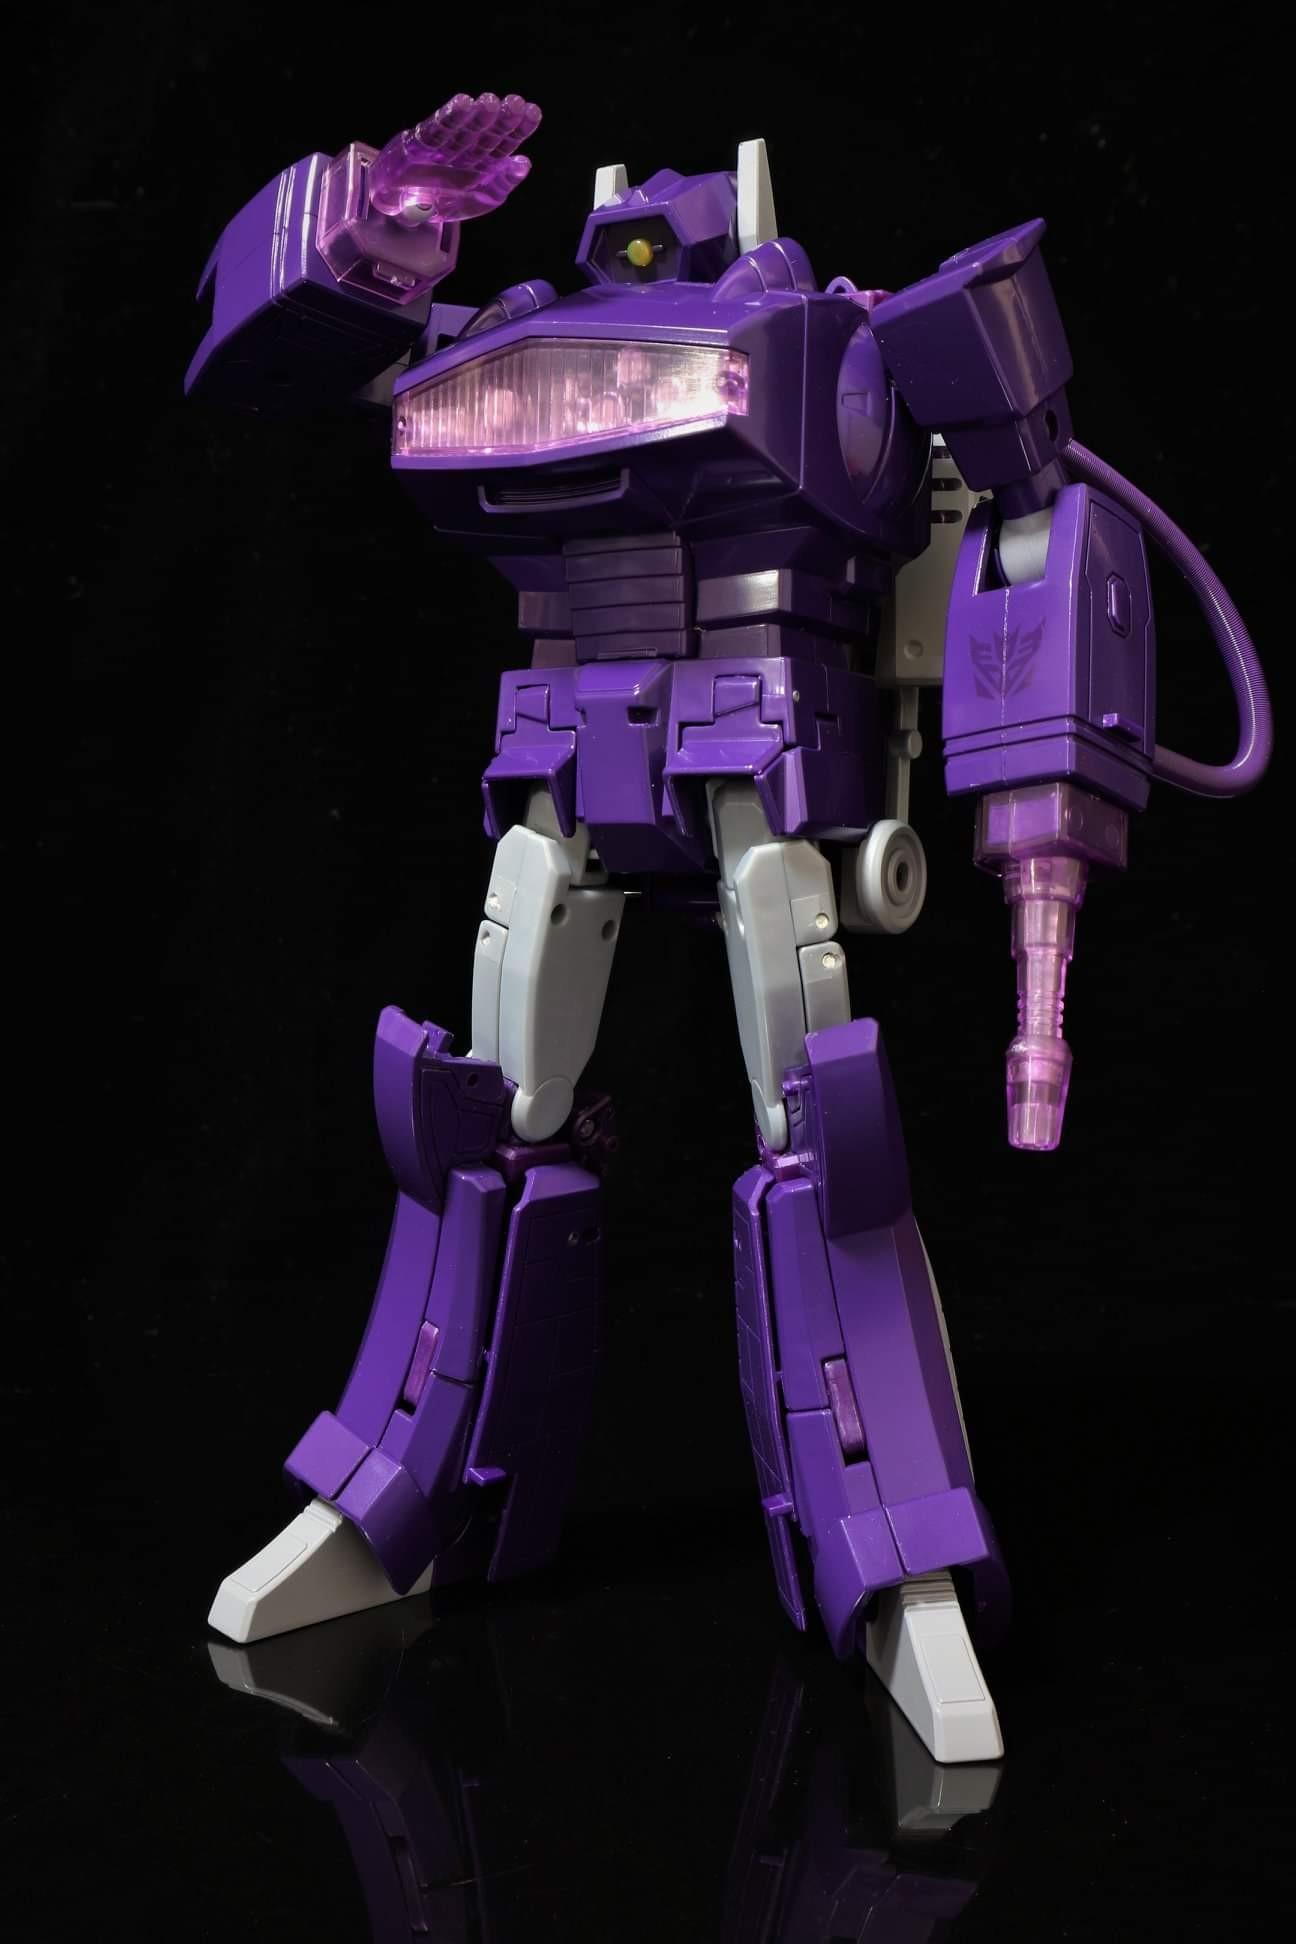 Transformers MP-29 MP29 Shock wave G1 modeling